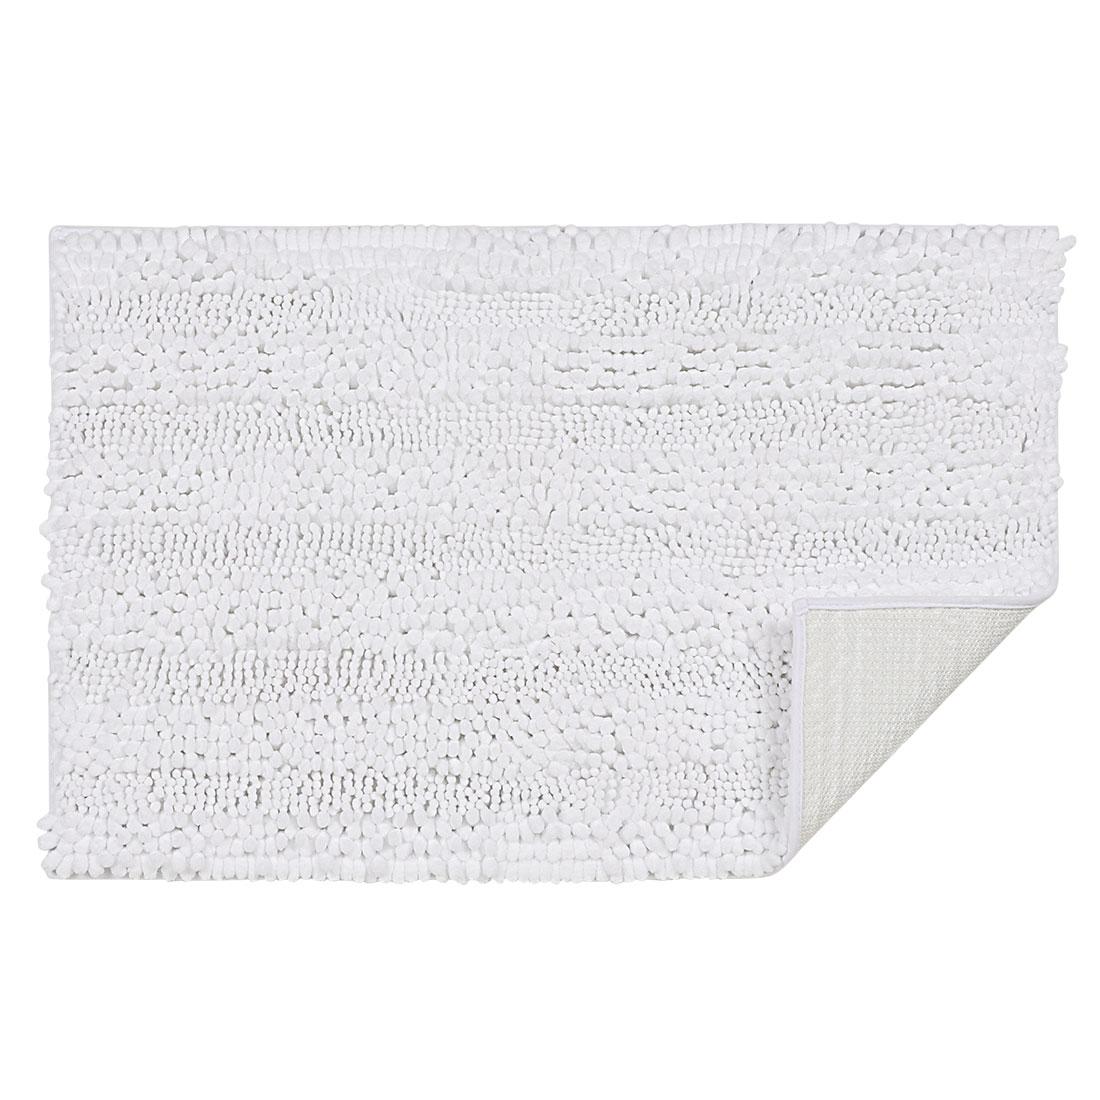 20 x 32 Inch Luxury Soft Plush Shaggy Bath Mat Chenille Rug Carpet White